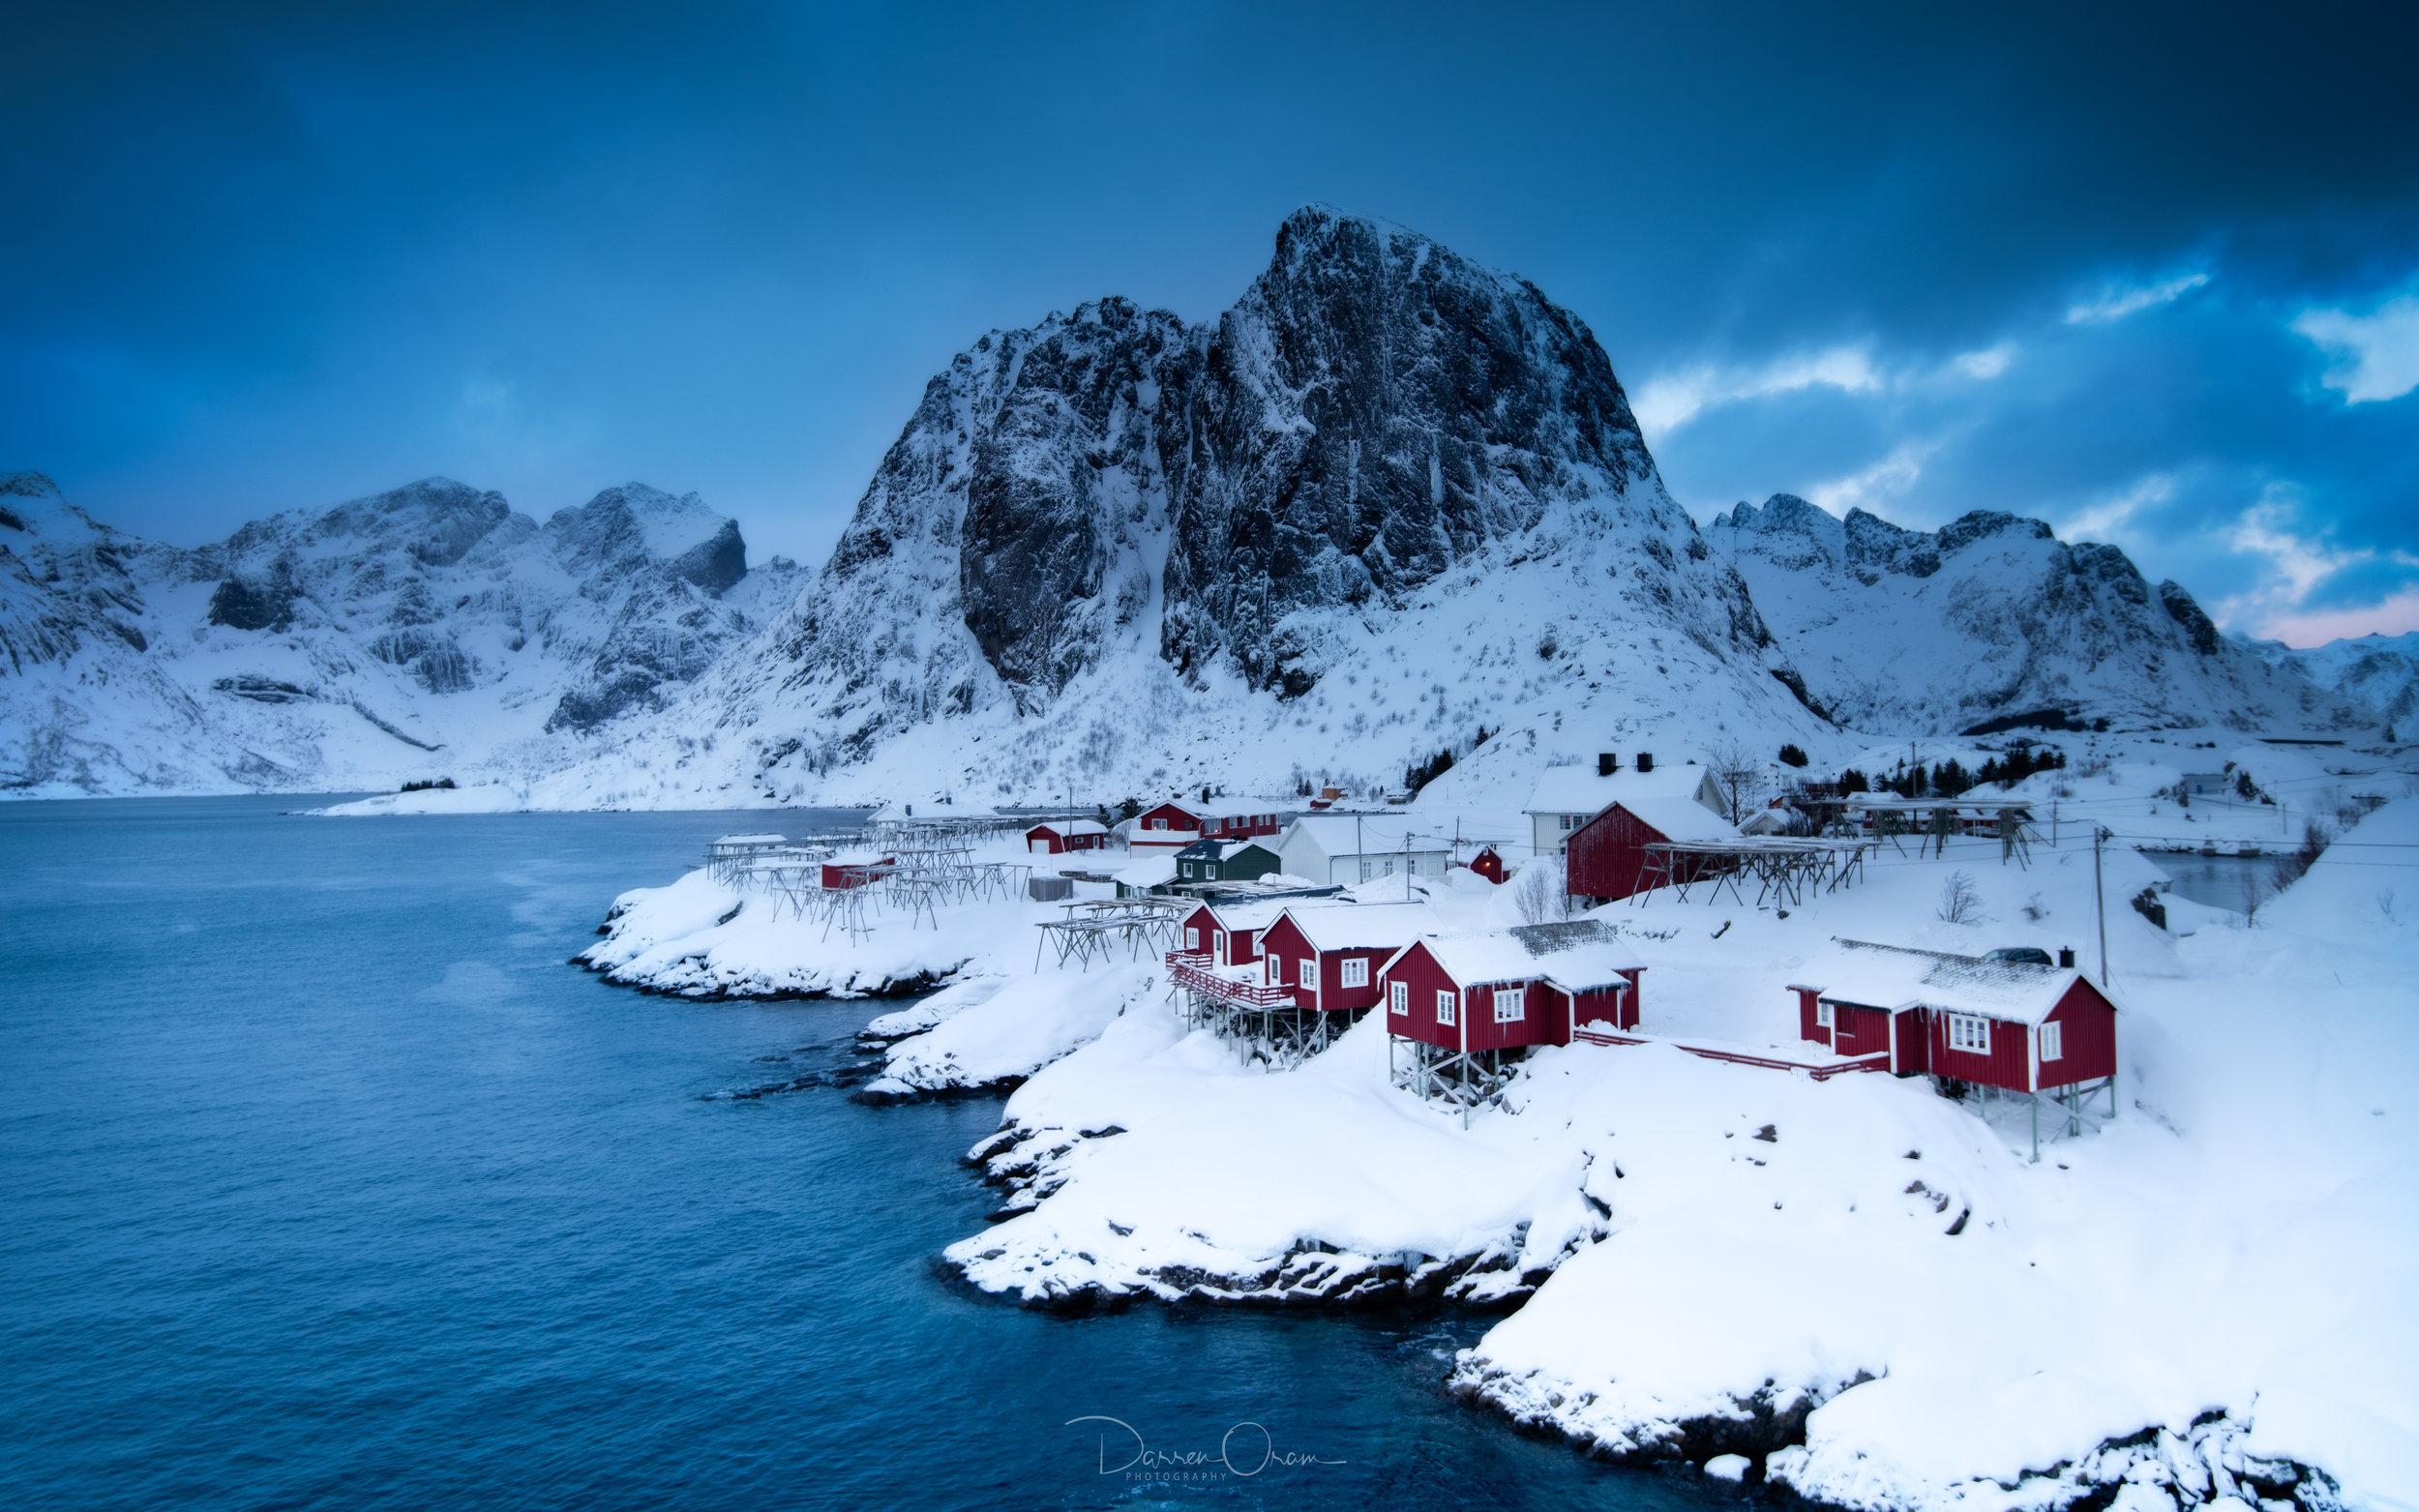 Hamnøy covered in snow